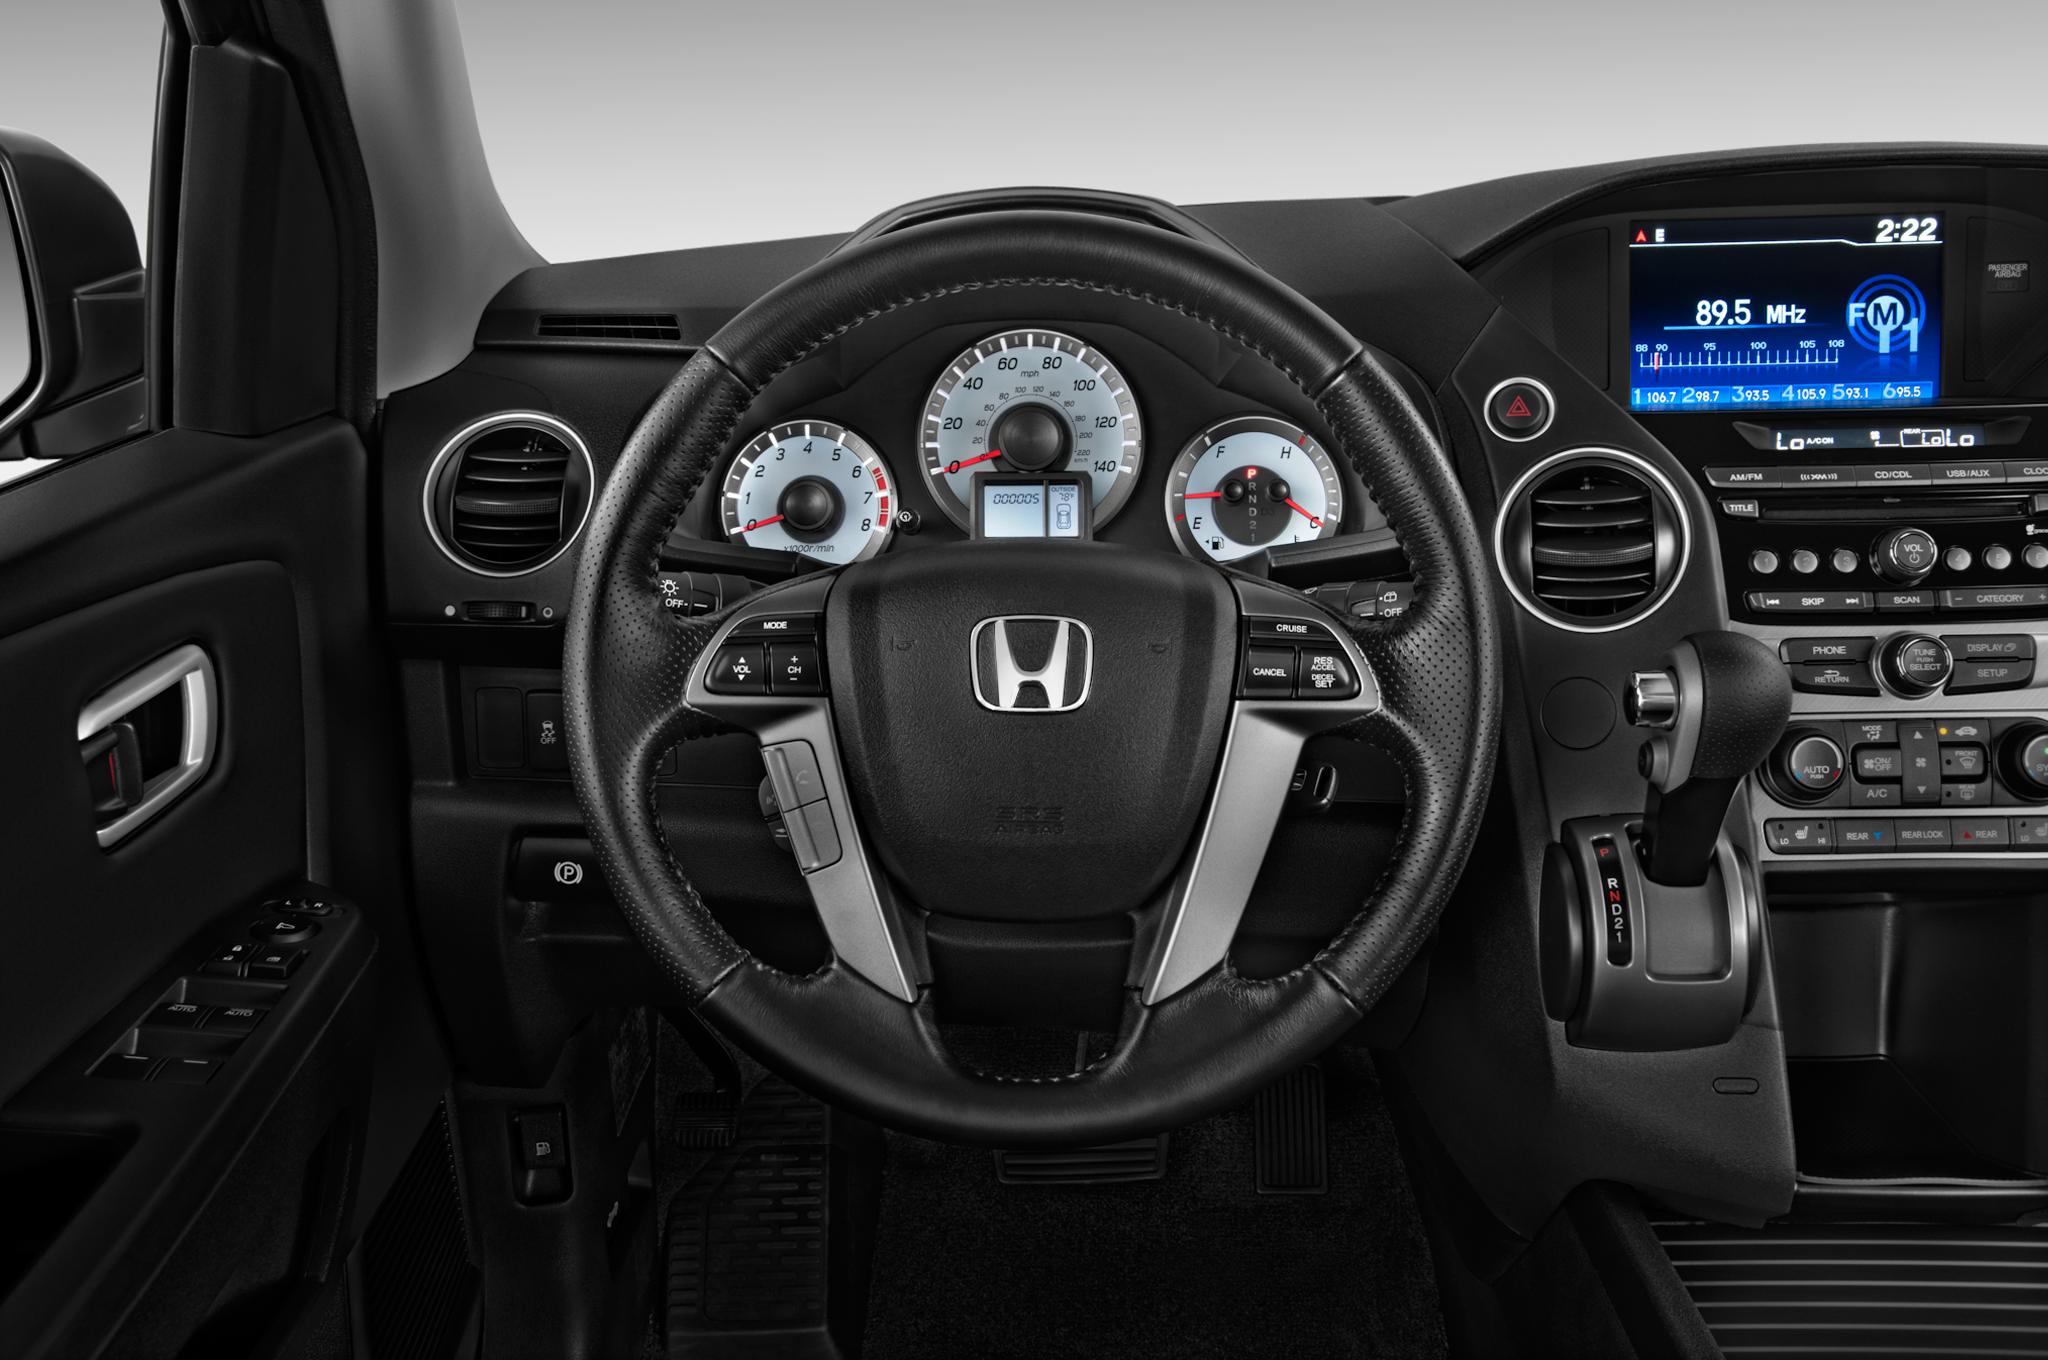 2012 Honda Pilot Touring - Editors' Notebook - Automobile ...